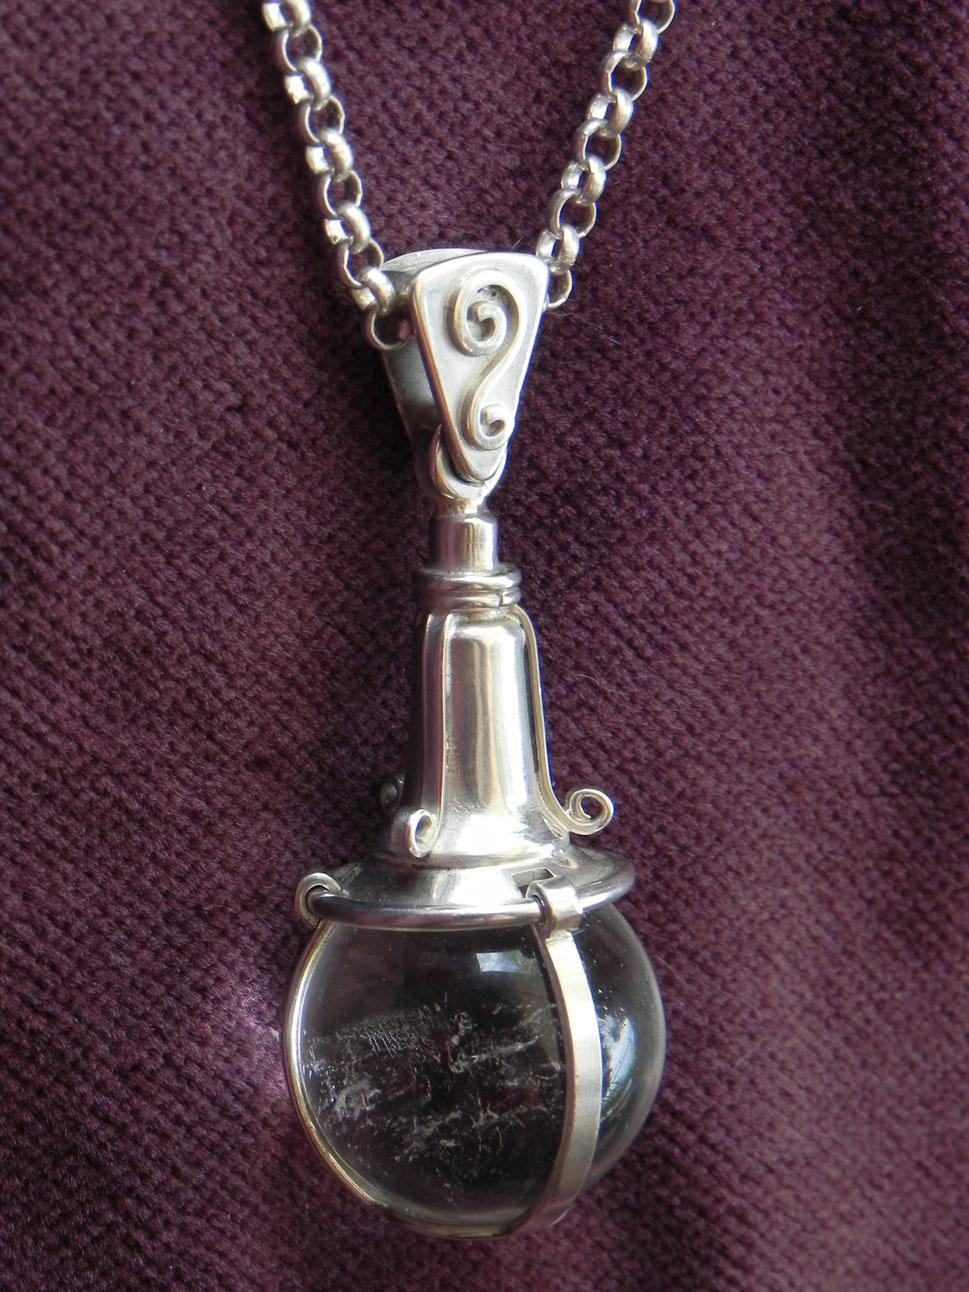 Bergkristallkugel in Silber eingefasst